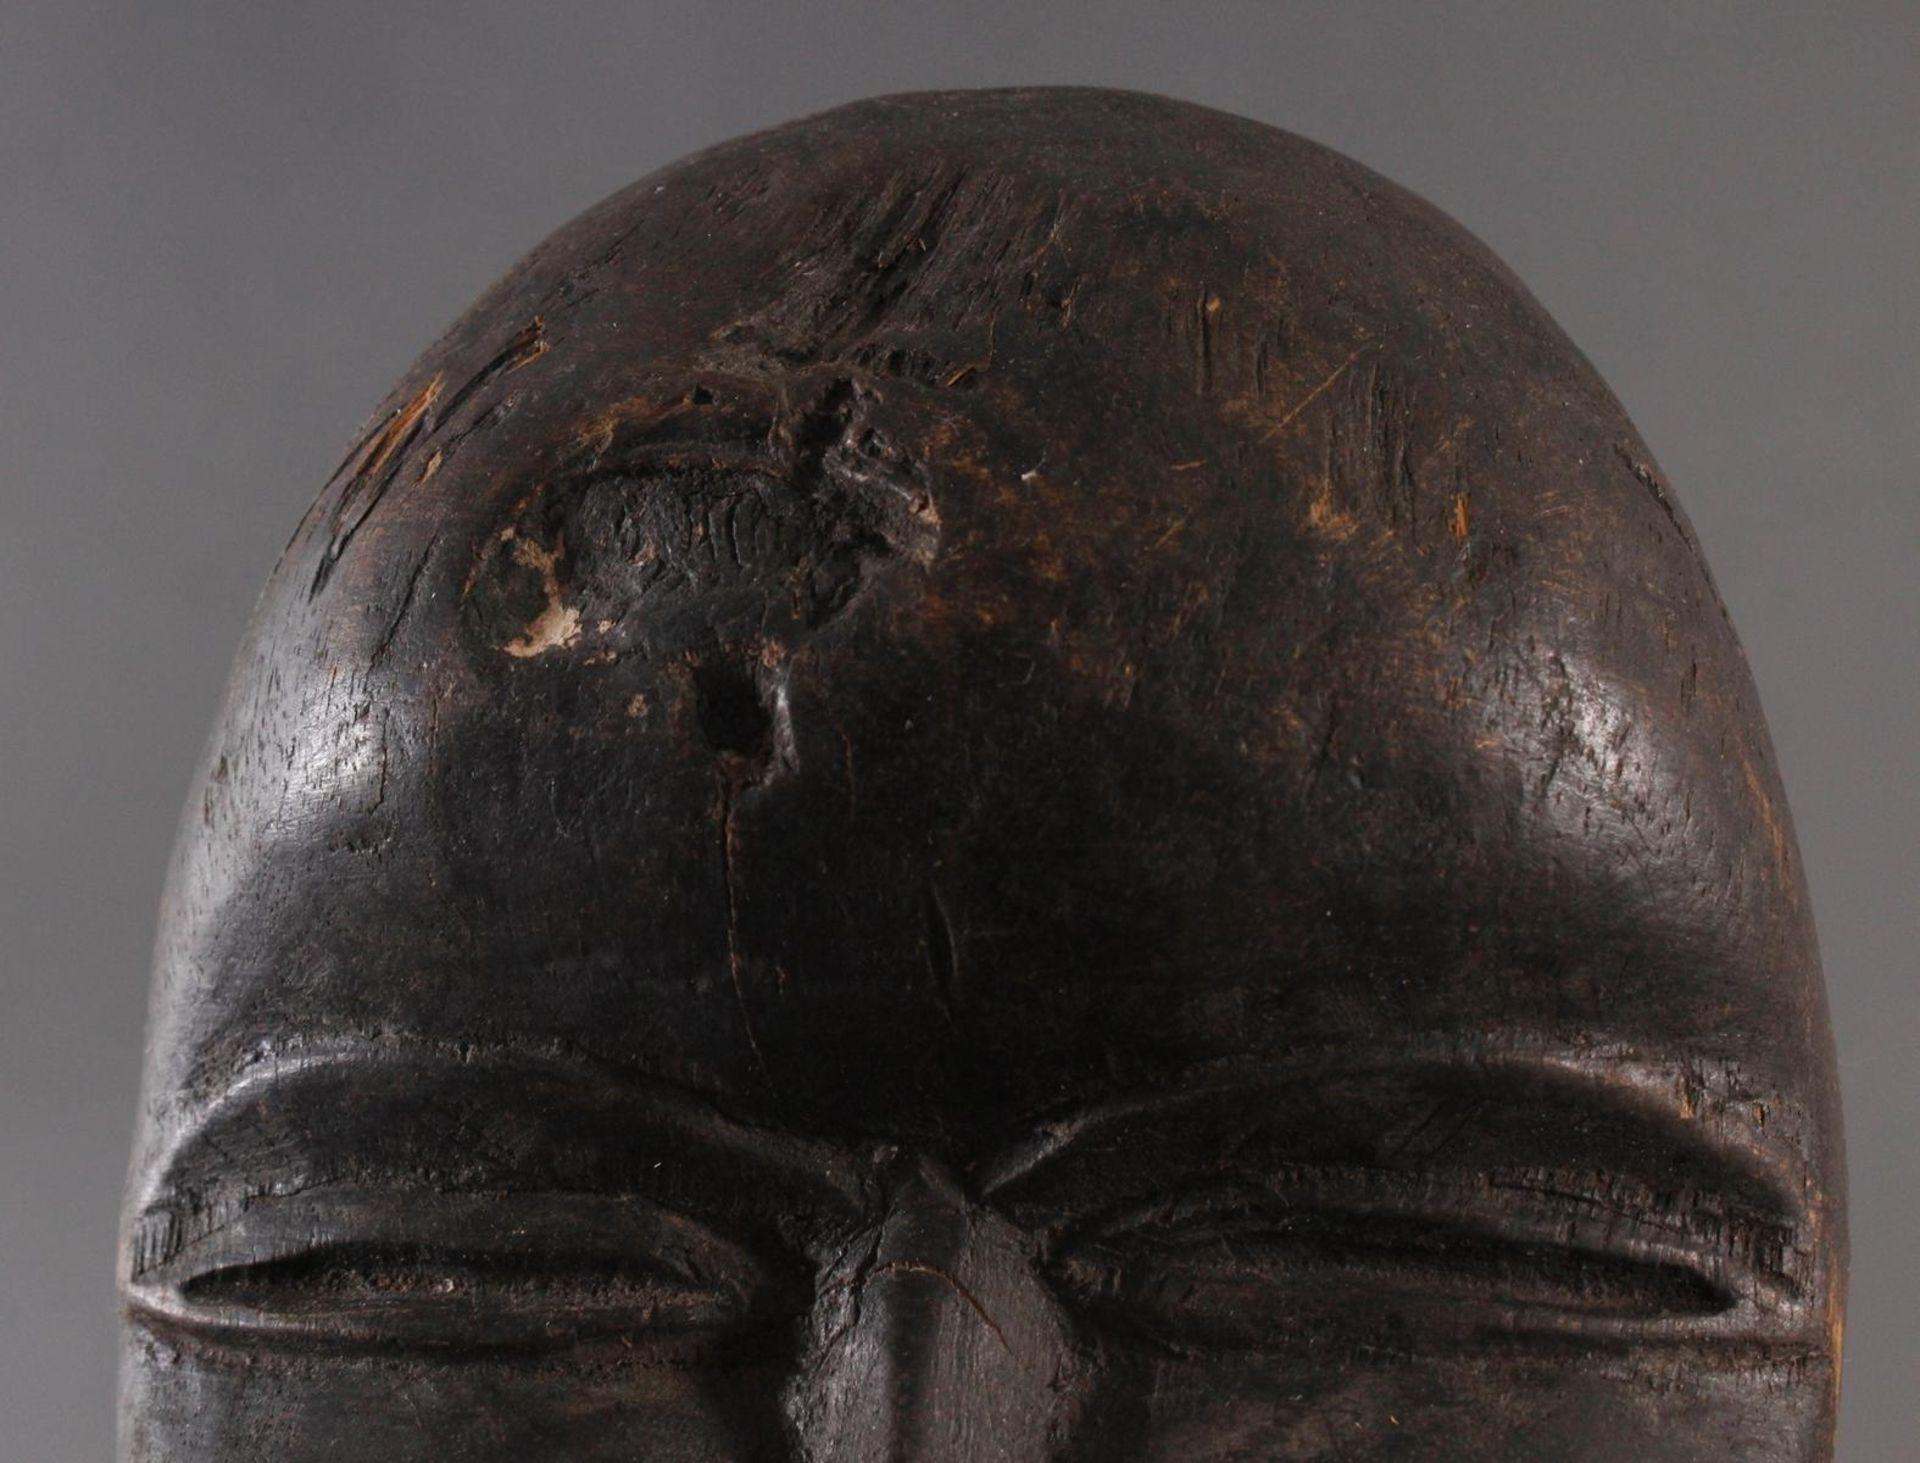 Antike Maske, Dan, Liberia 1. Hälfte 20. Jh.Holz geschnitzt, dunkle Patina, Schnabelmaske, ca. 6 x - Bild 6 aus 6